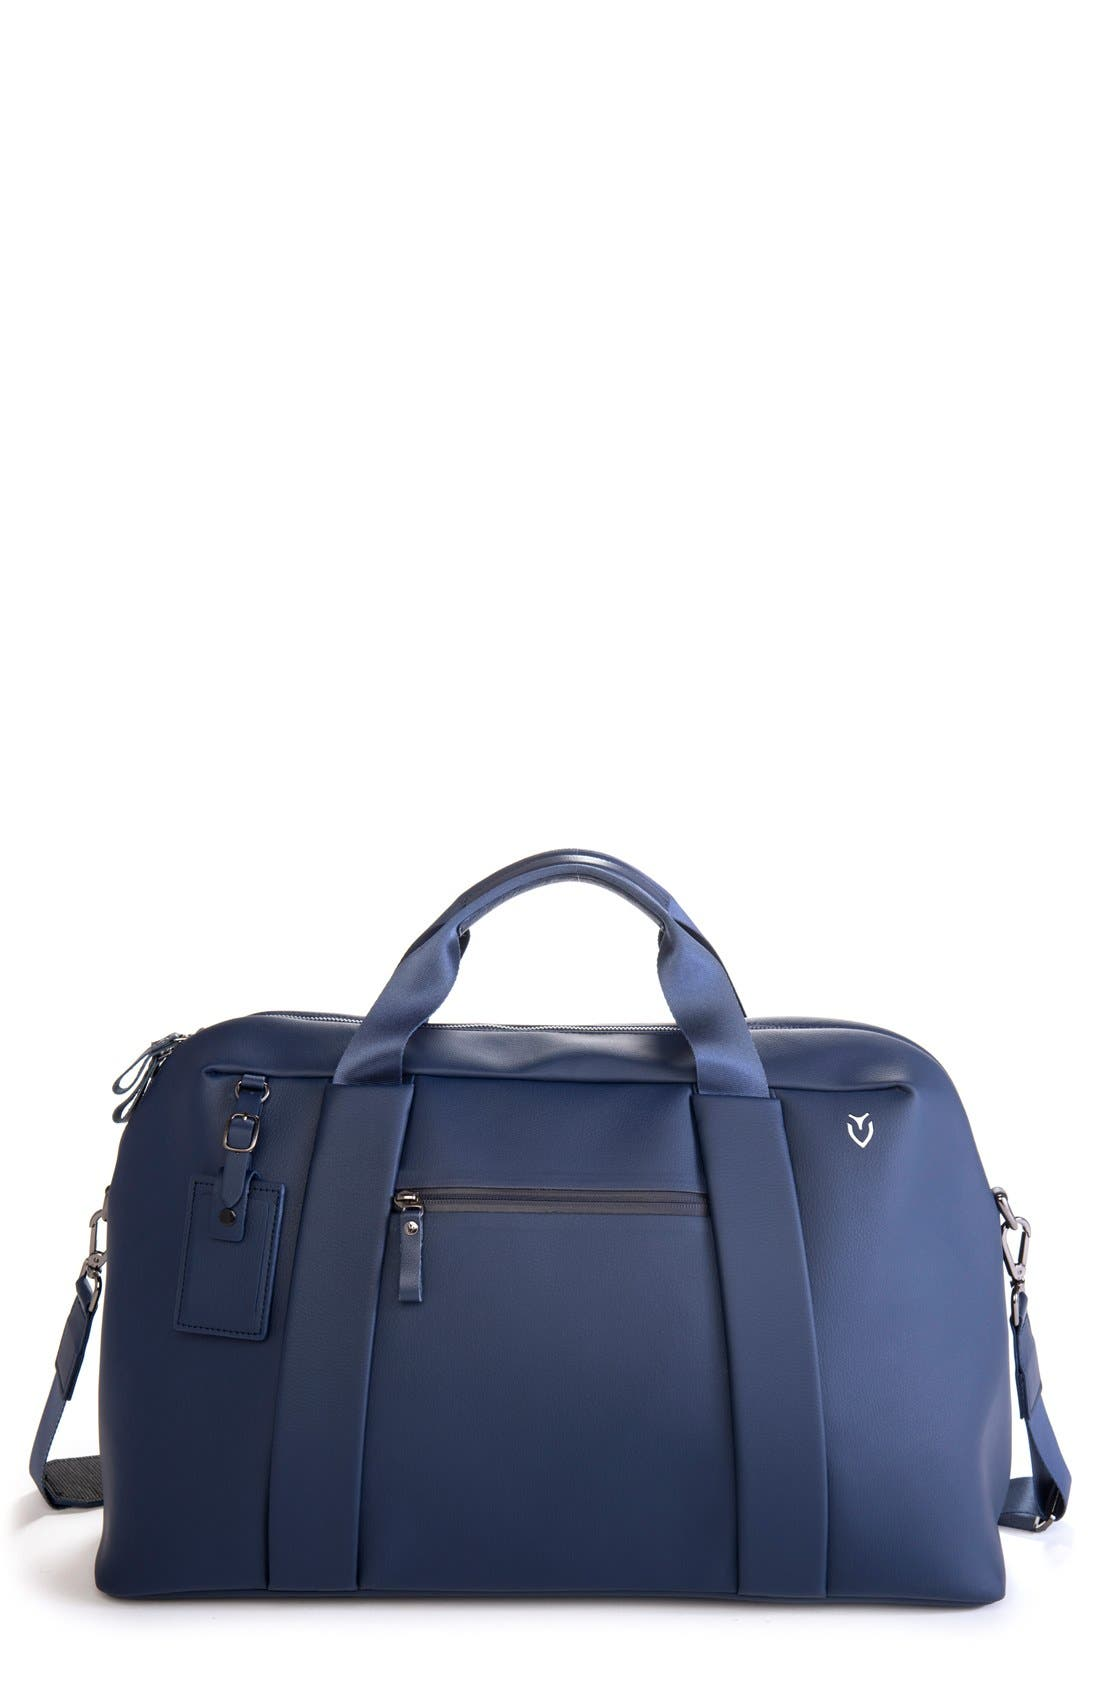 'Signature' Large Duffel Bag,                             Main thumbnail 1, color,                             Pebbled Navy